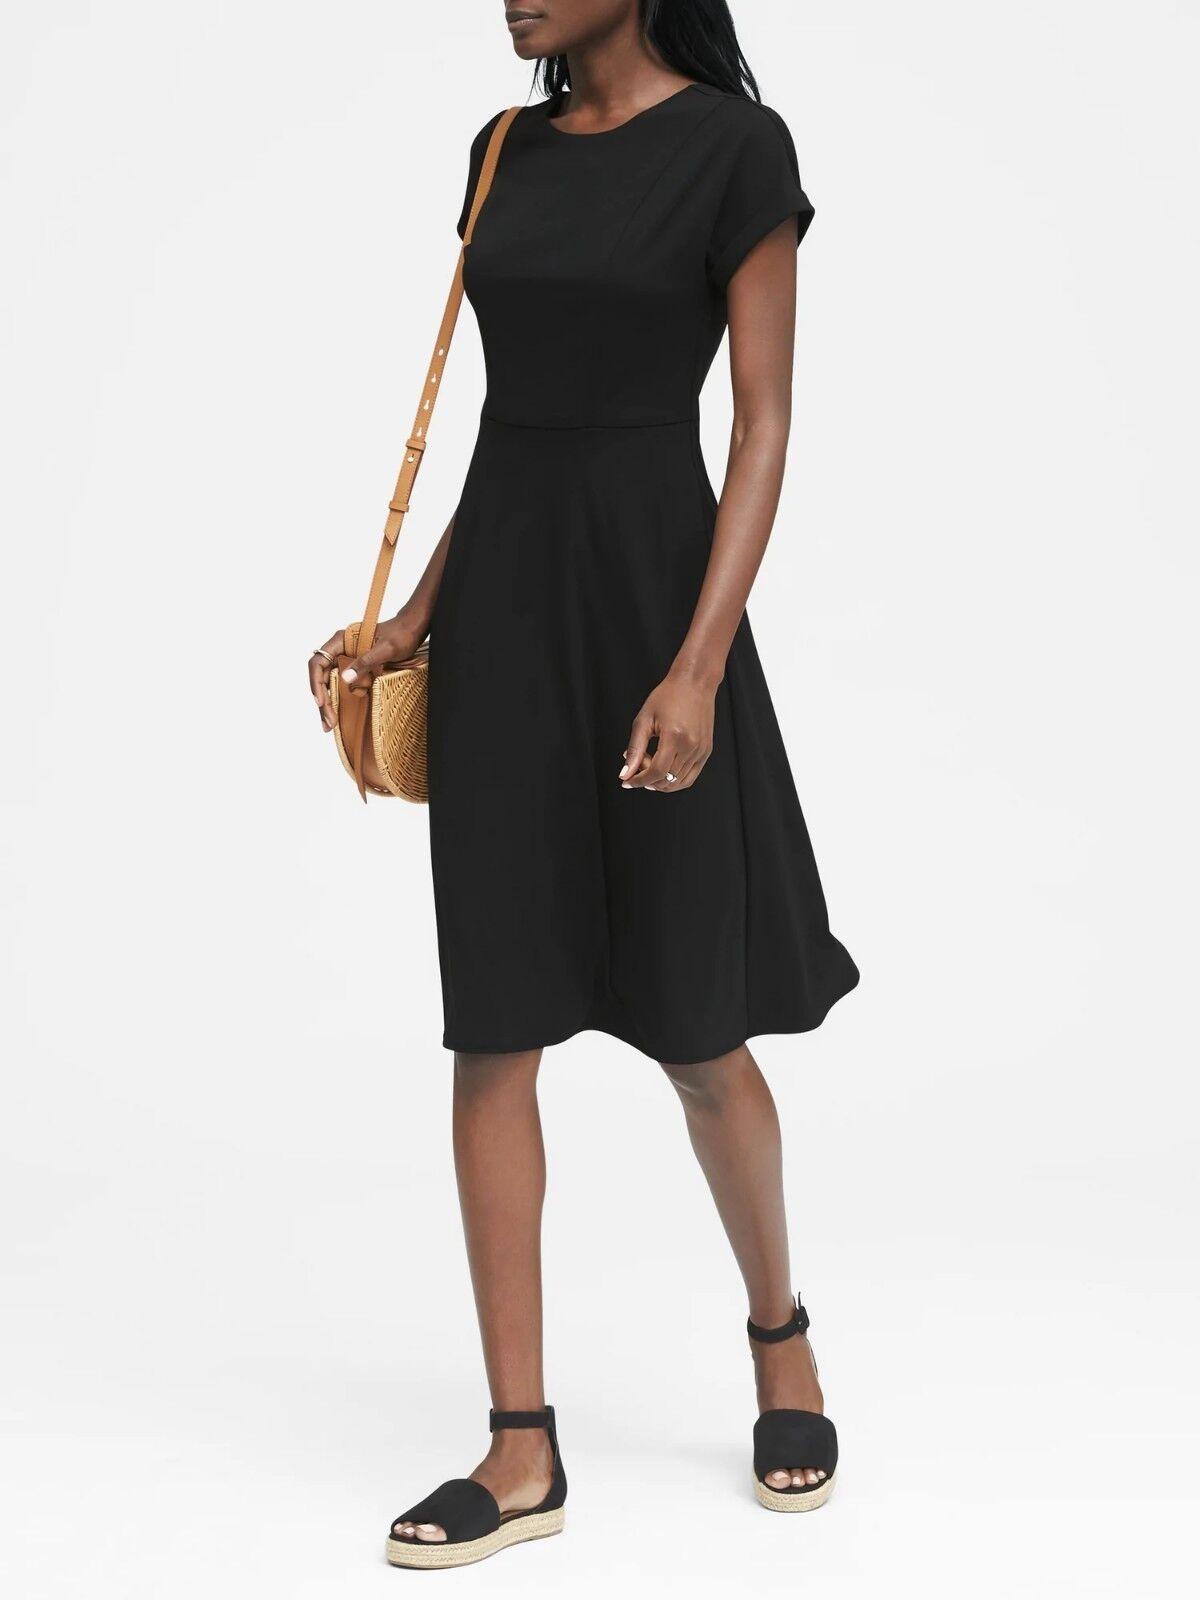 Banana Republic Soft Ponte Tie-Back Fit-and-Flare Dress,schwarz SZ 8 E823